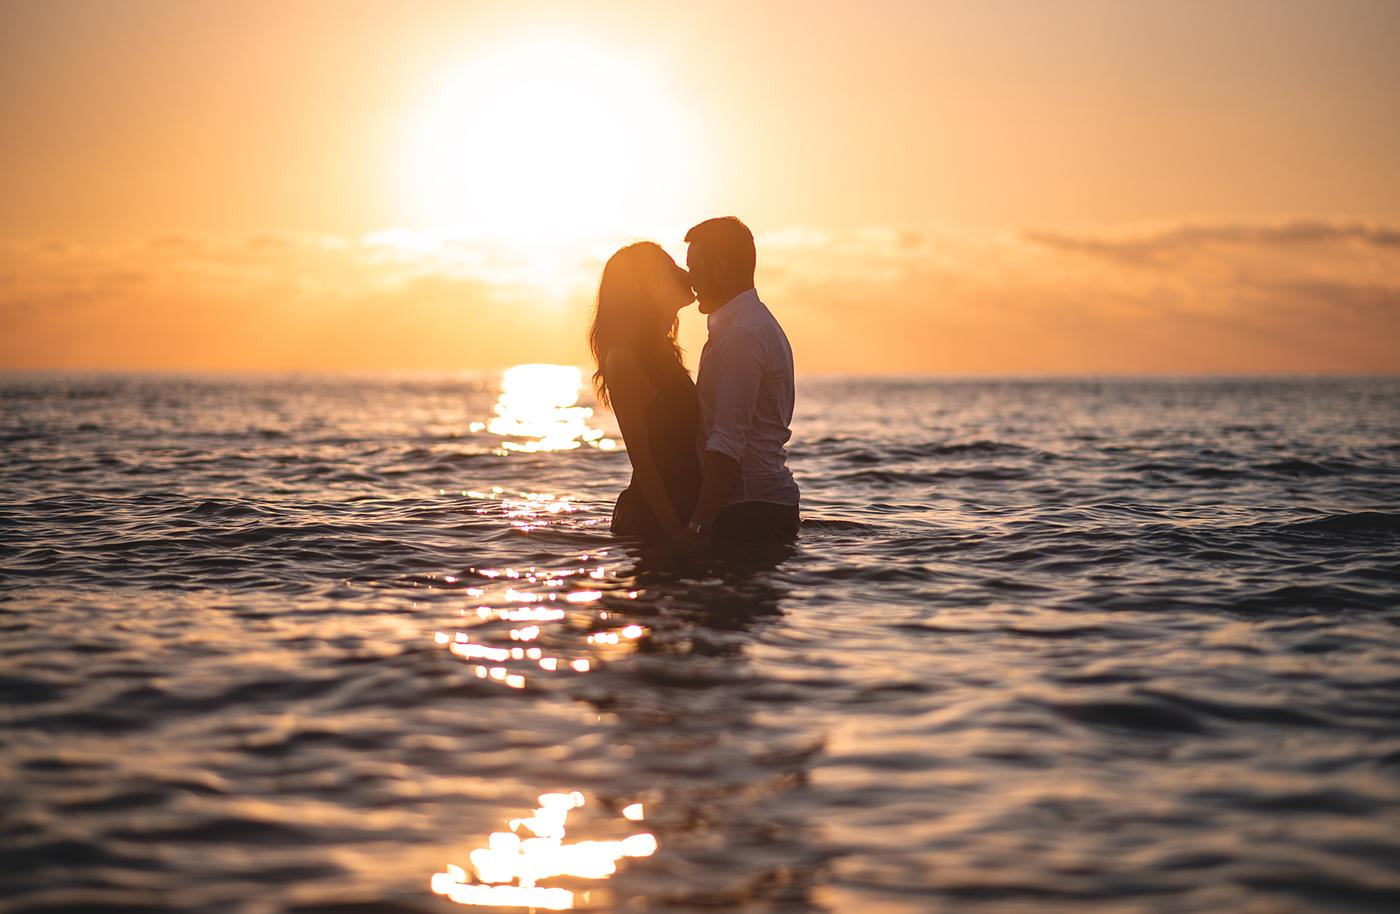 Pre-wedding photography service on the beach in Tortolì, Sardinia